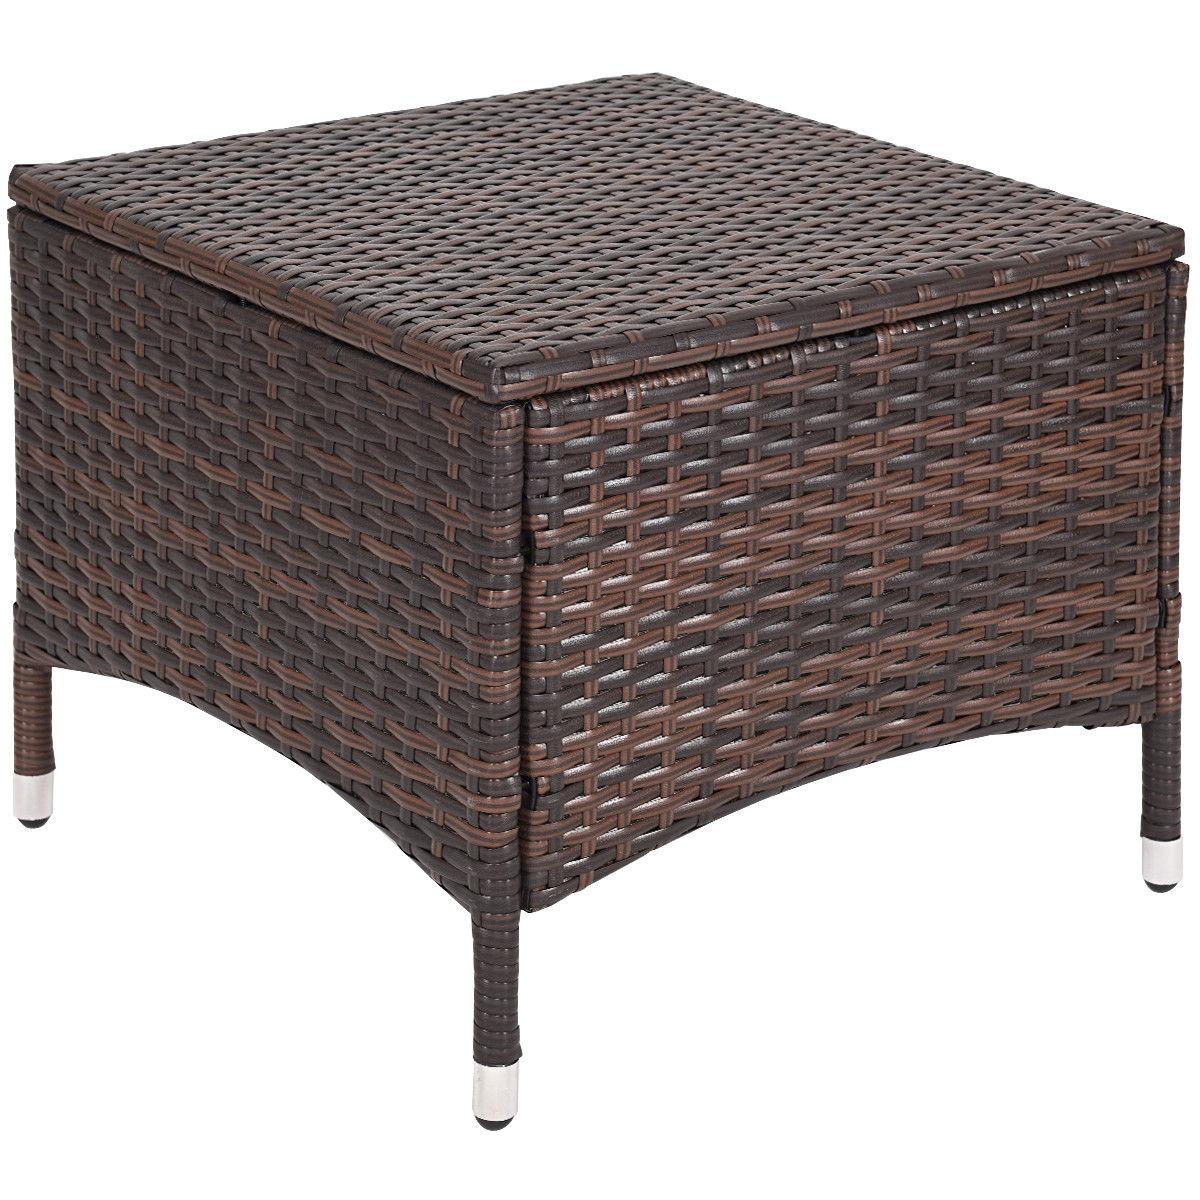 3PCS Outdoor Patio Rattan Wicker Furniture Set